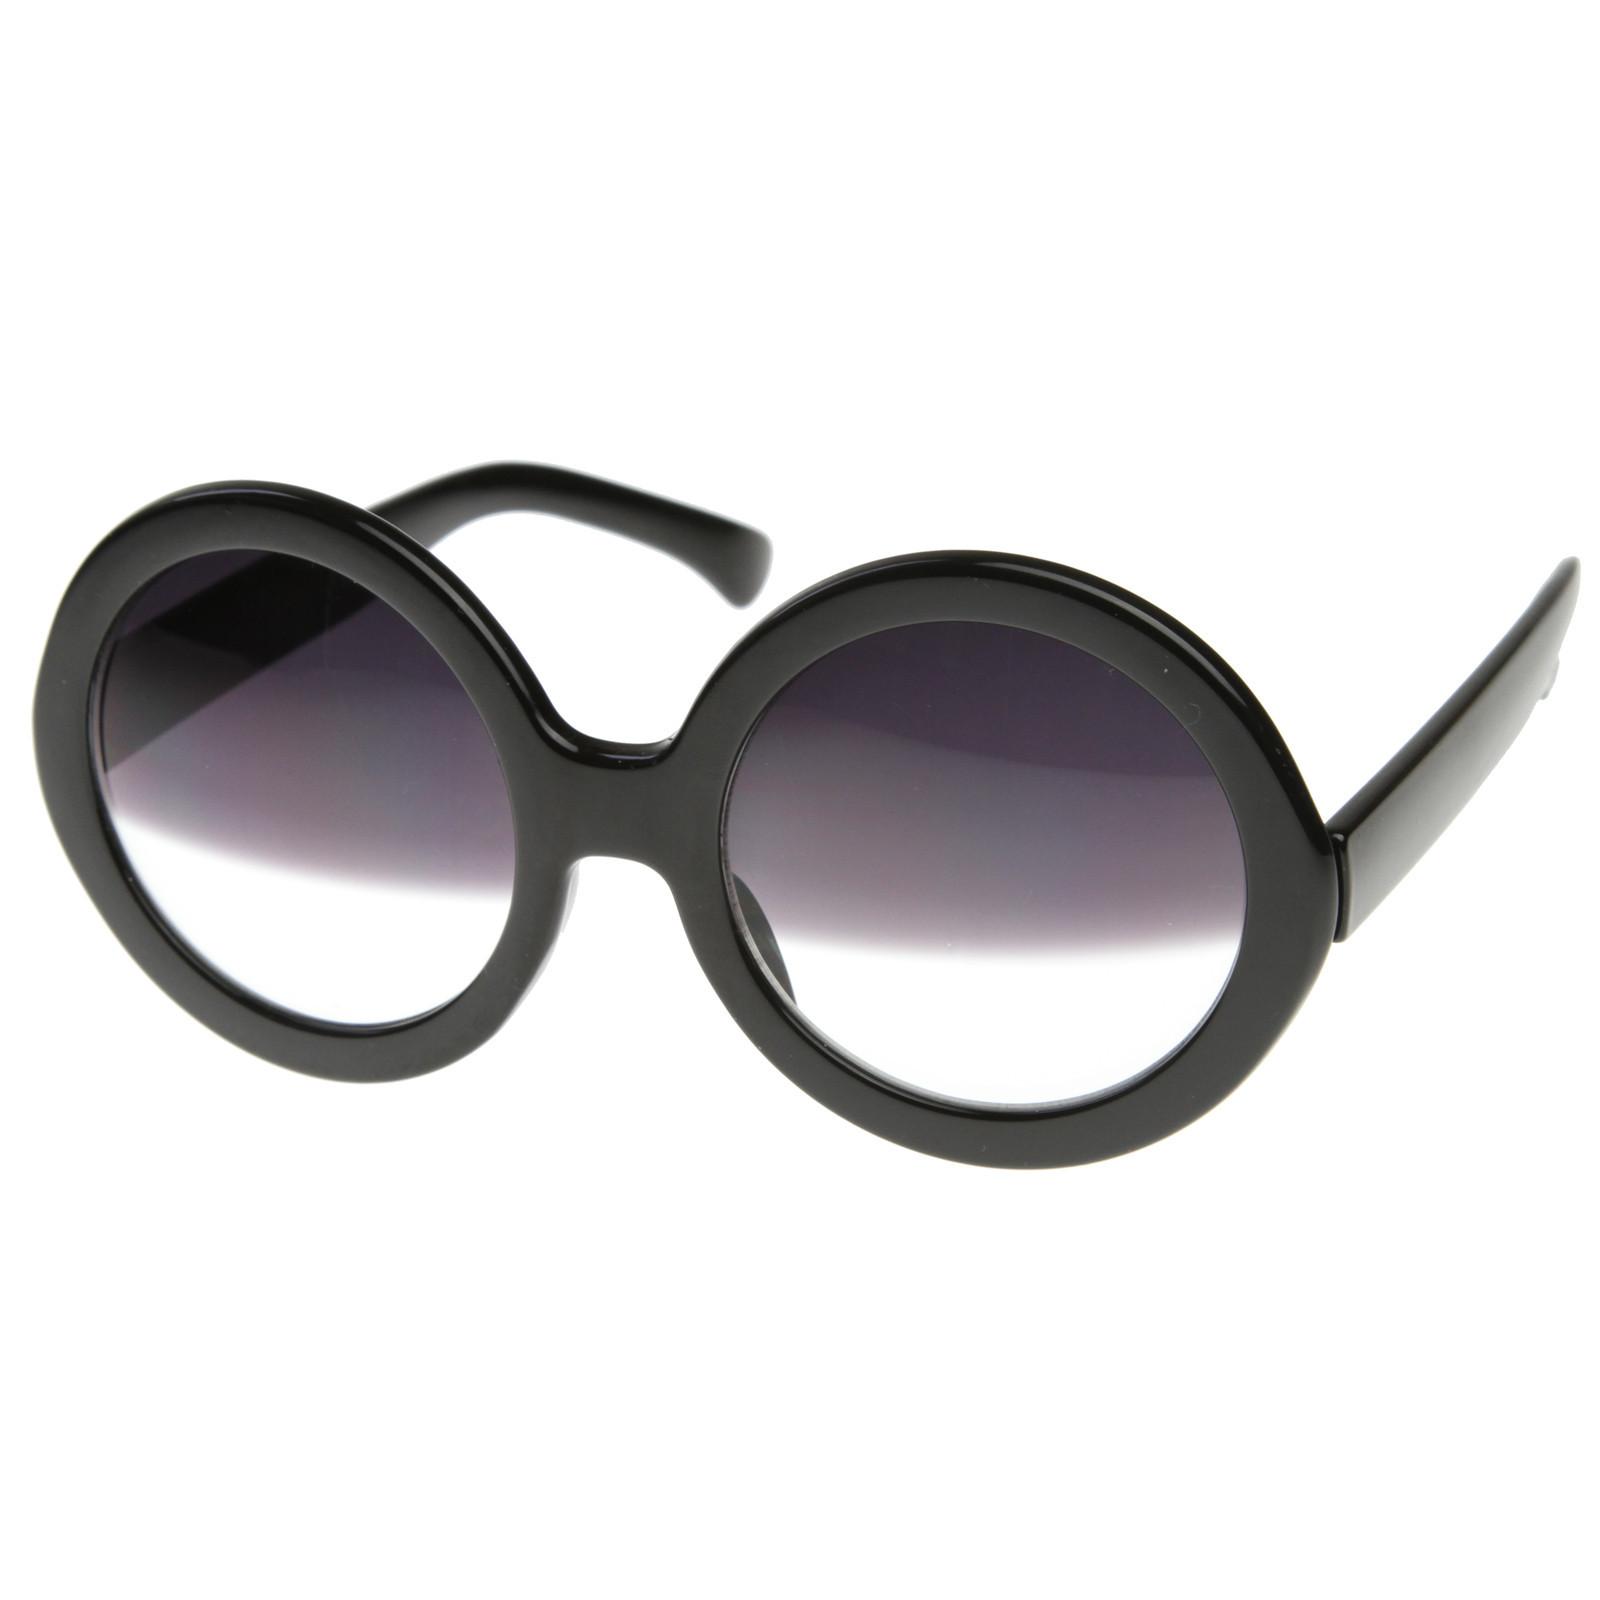 Celebrity nicole richie oversize round half tint sunglasses 8511